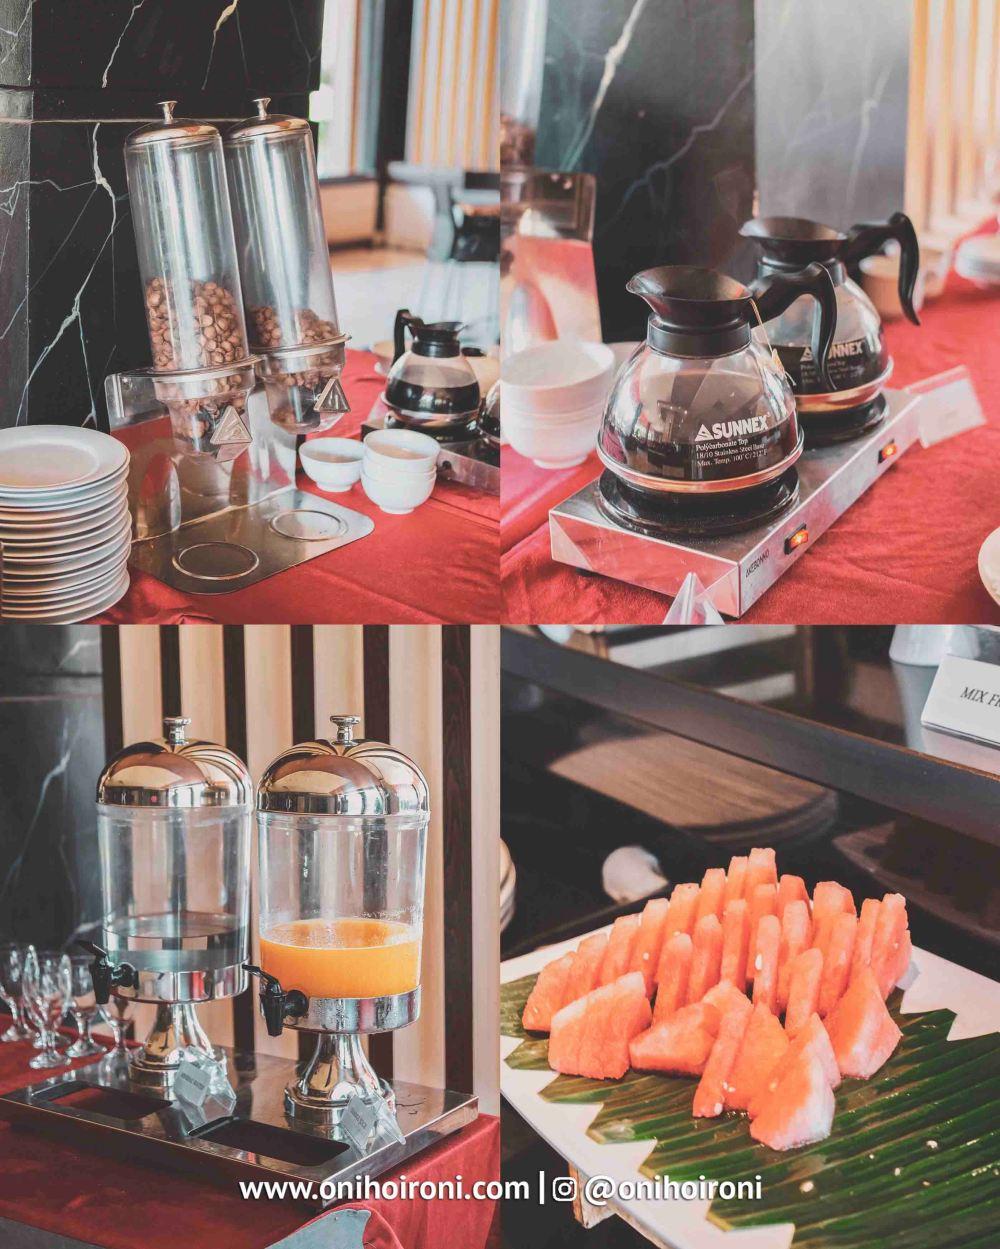 Breakfast M One Hotel Sentul Bogor, Onihoironi